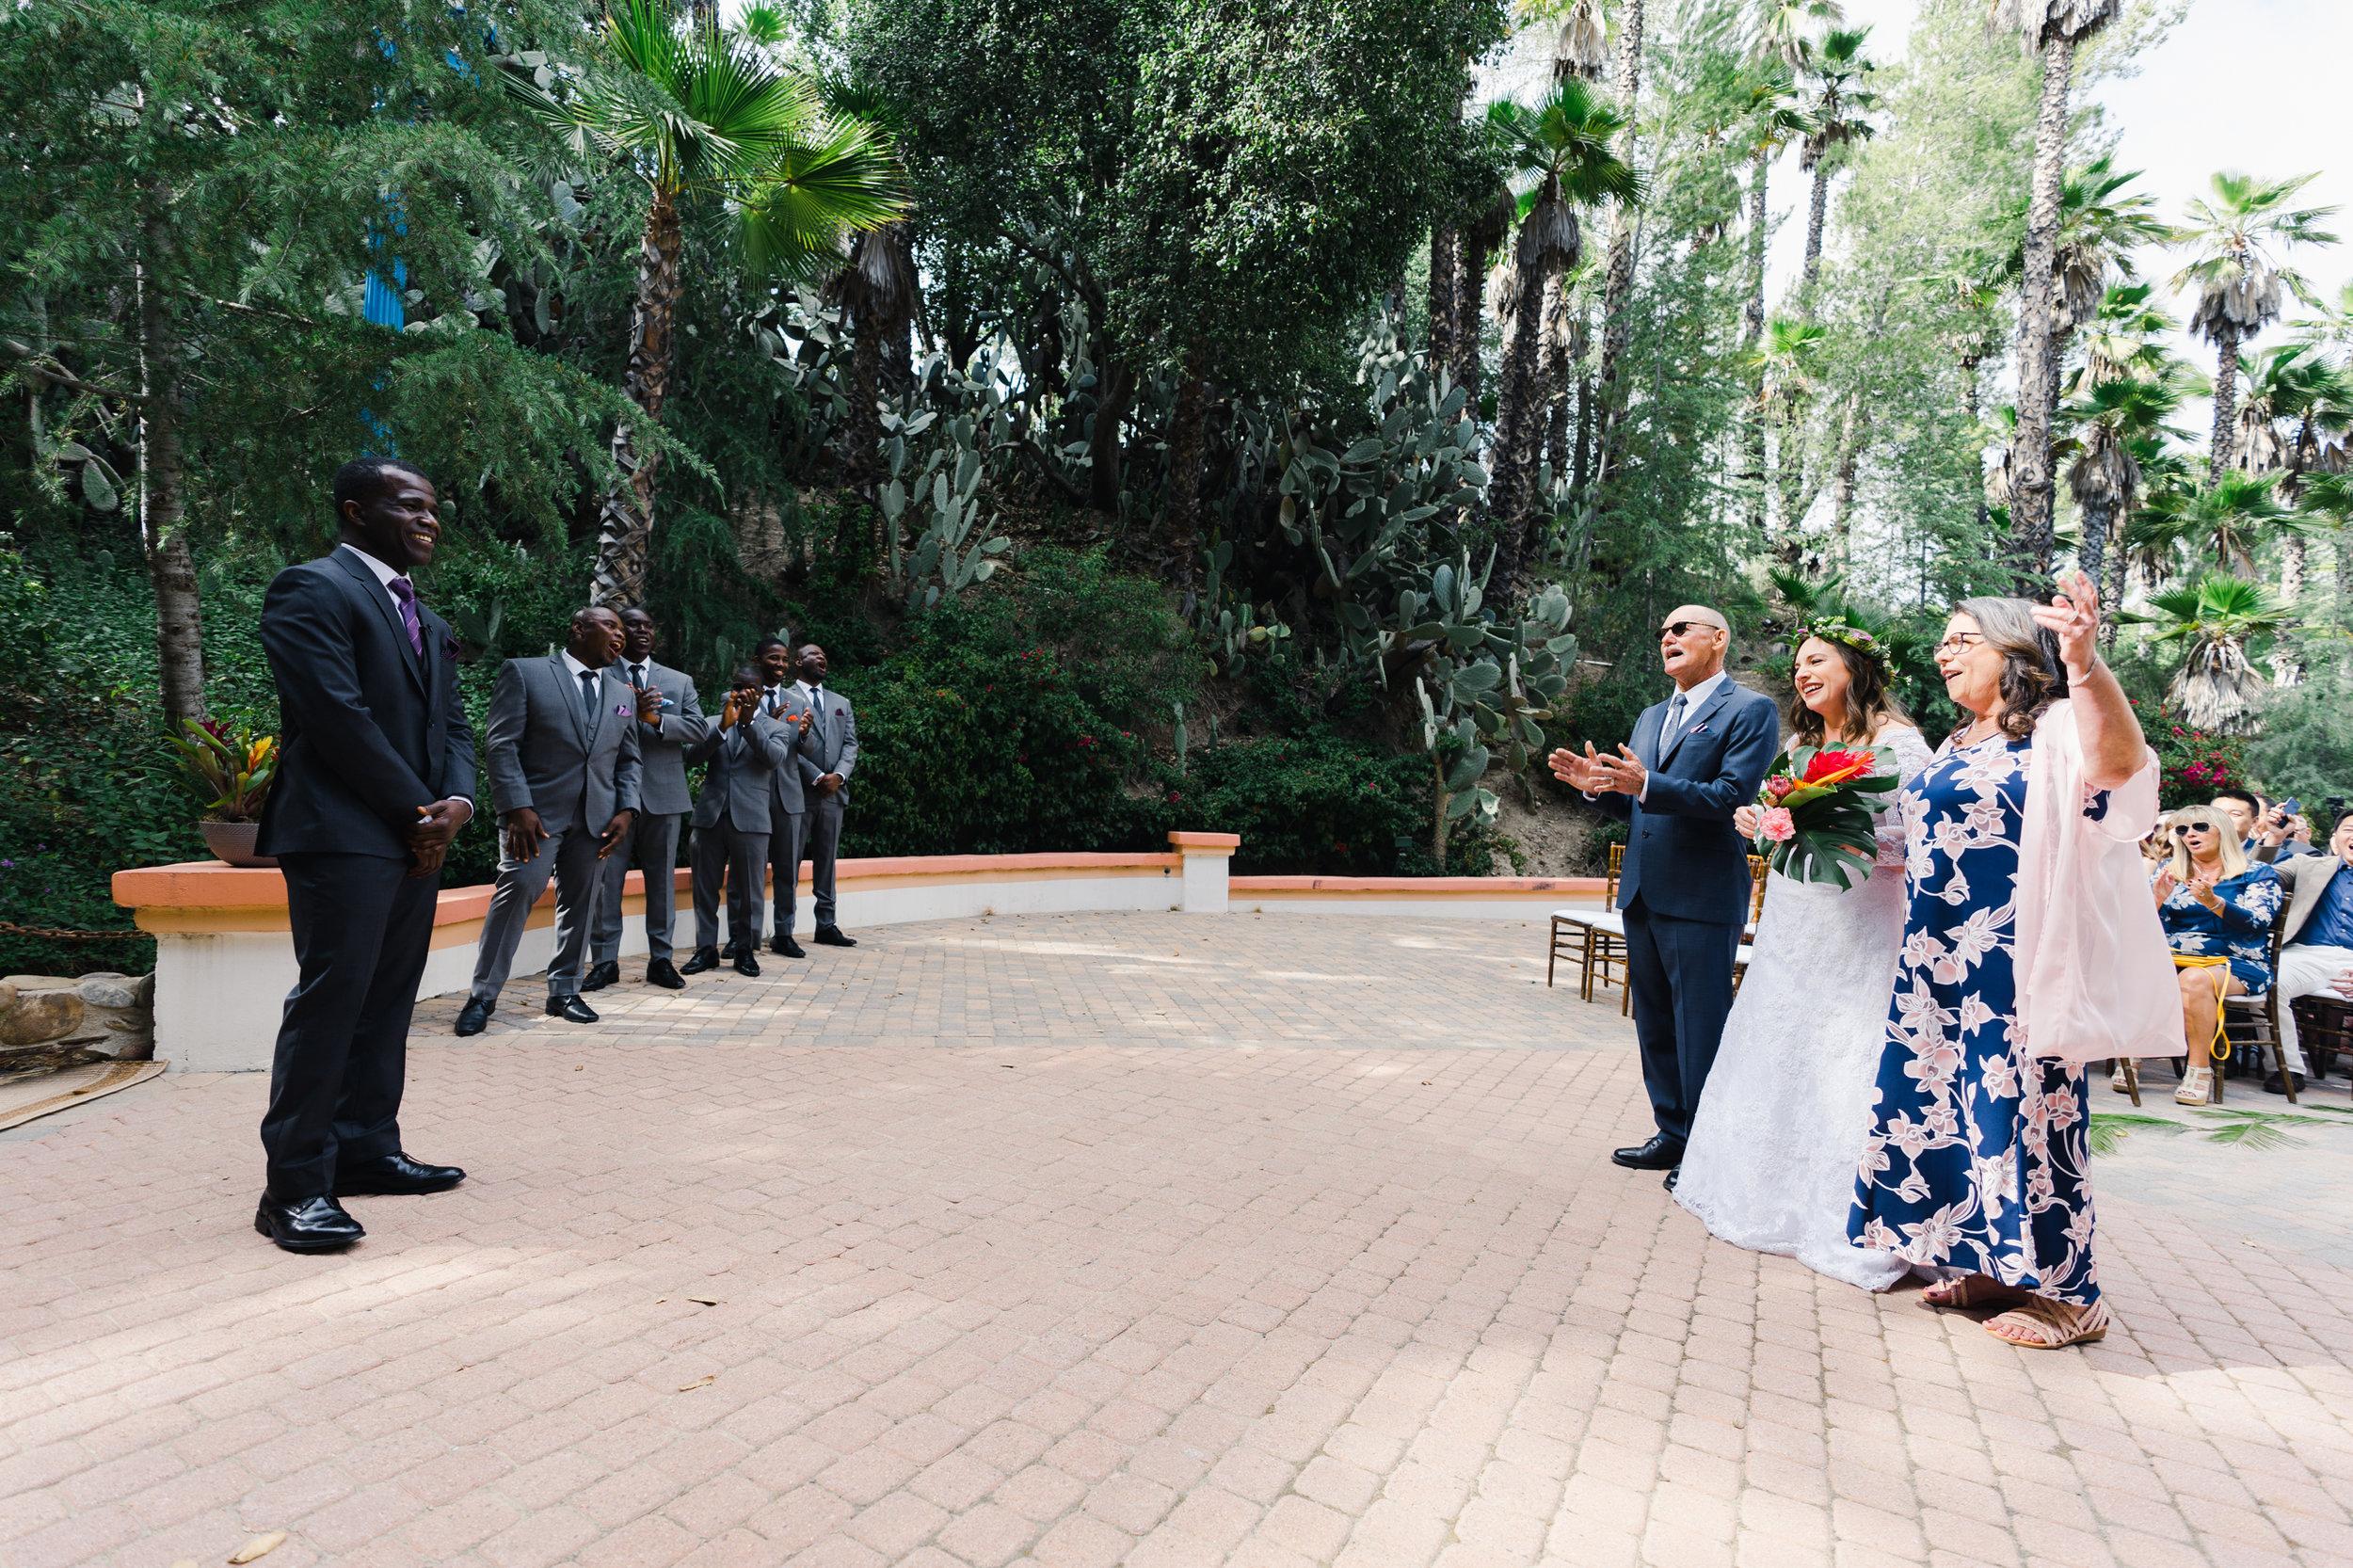 rancho-las-lomas-wedding-kelsey-sim_0115.JPG